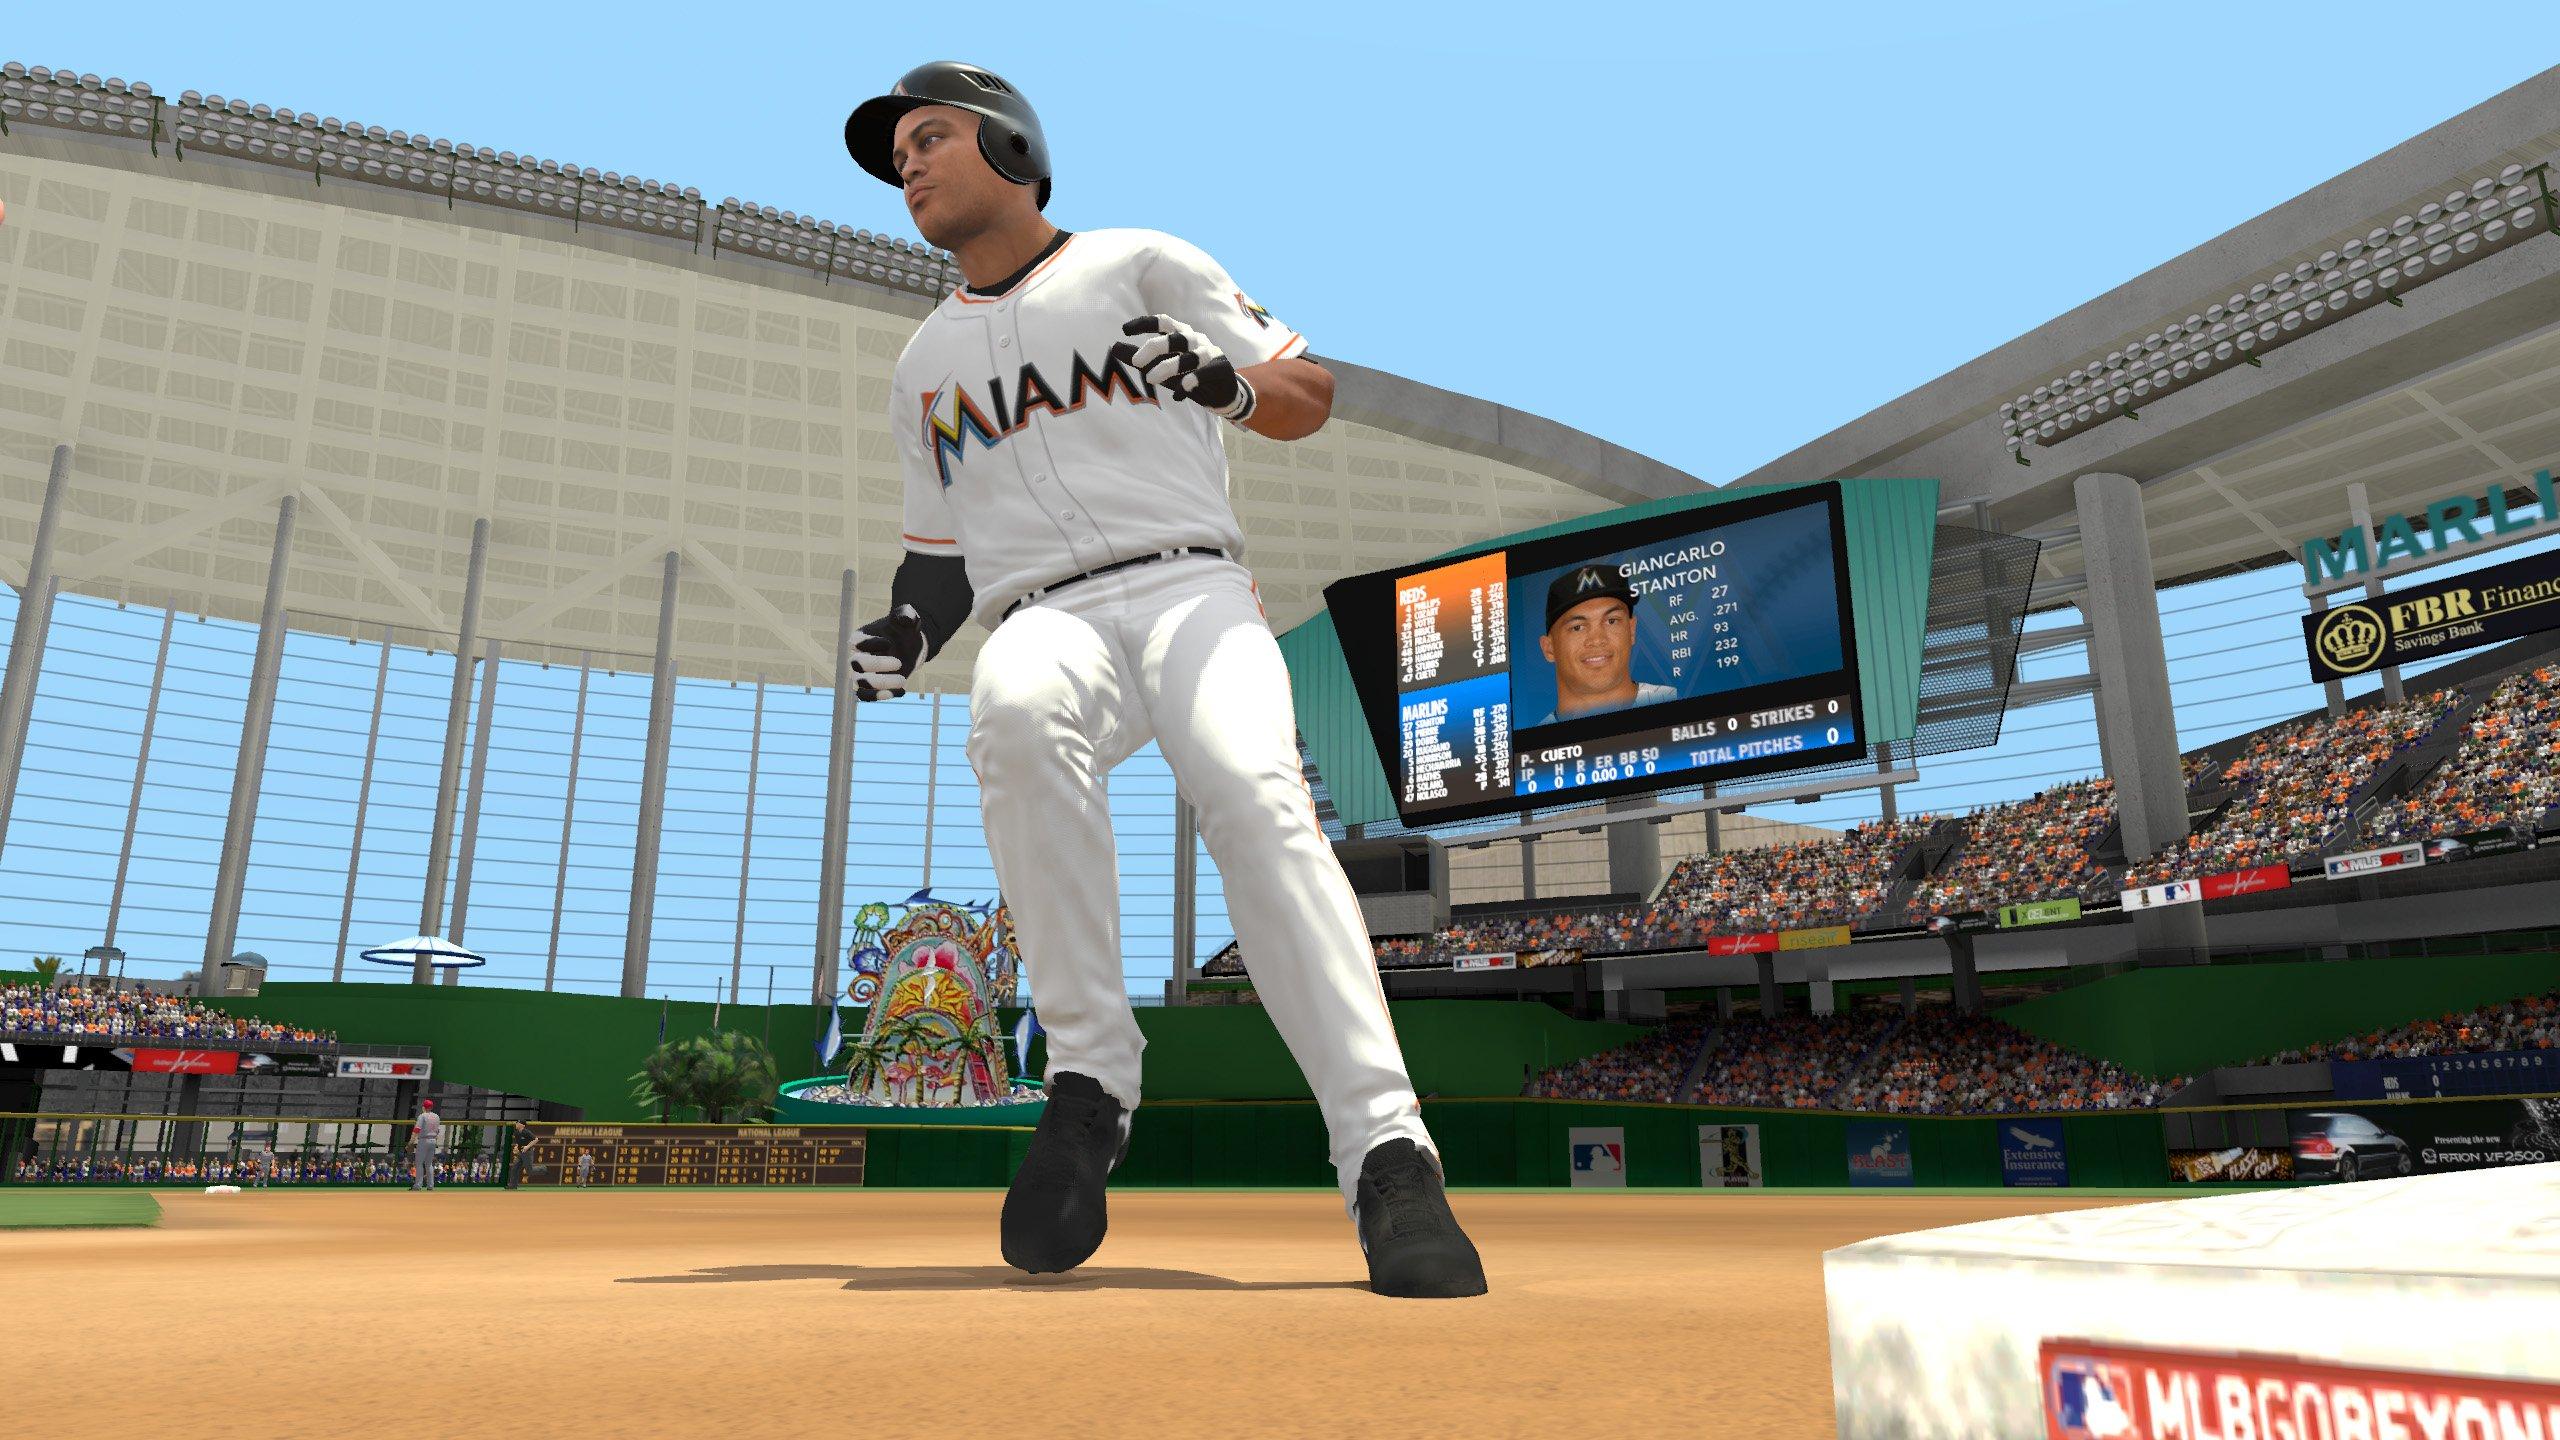 2k14 baseball xbox 360